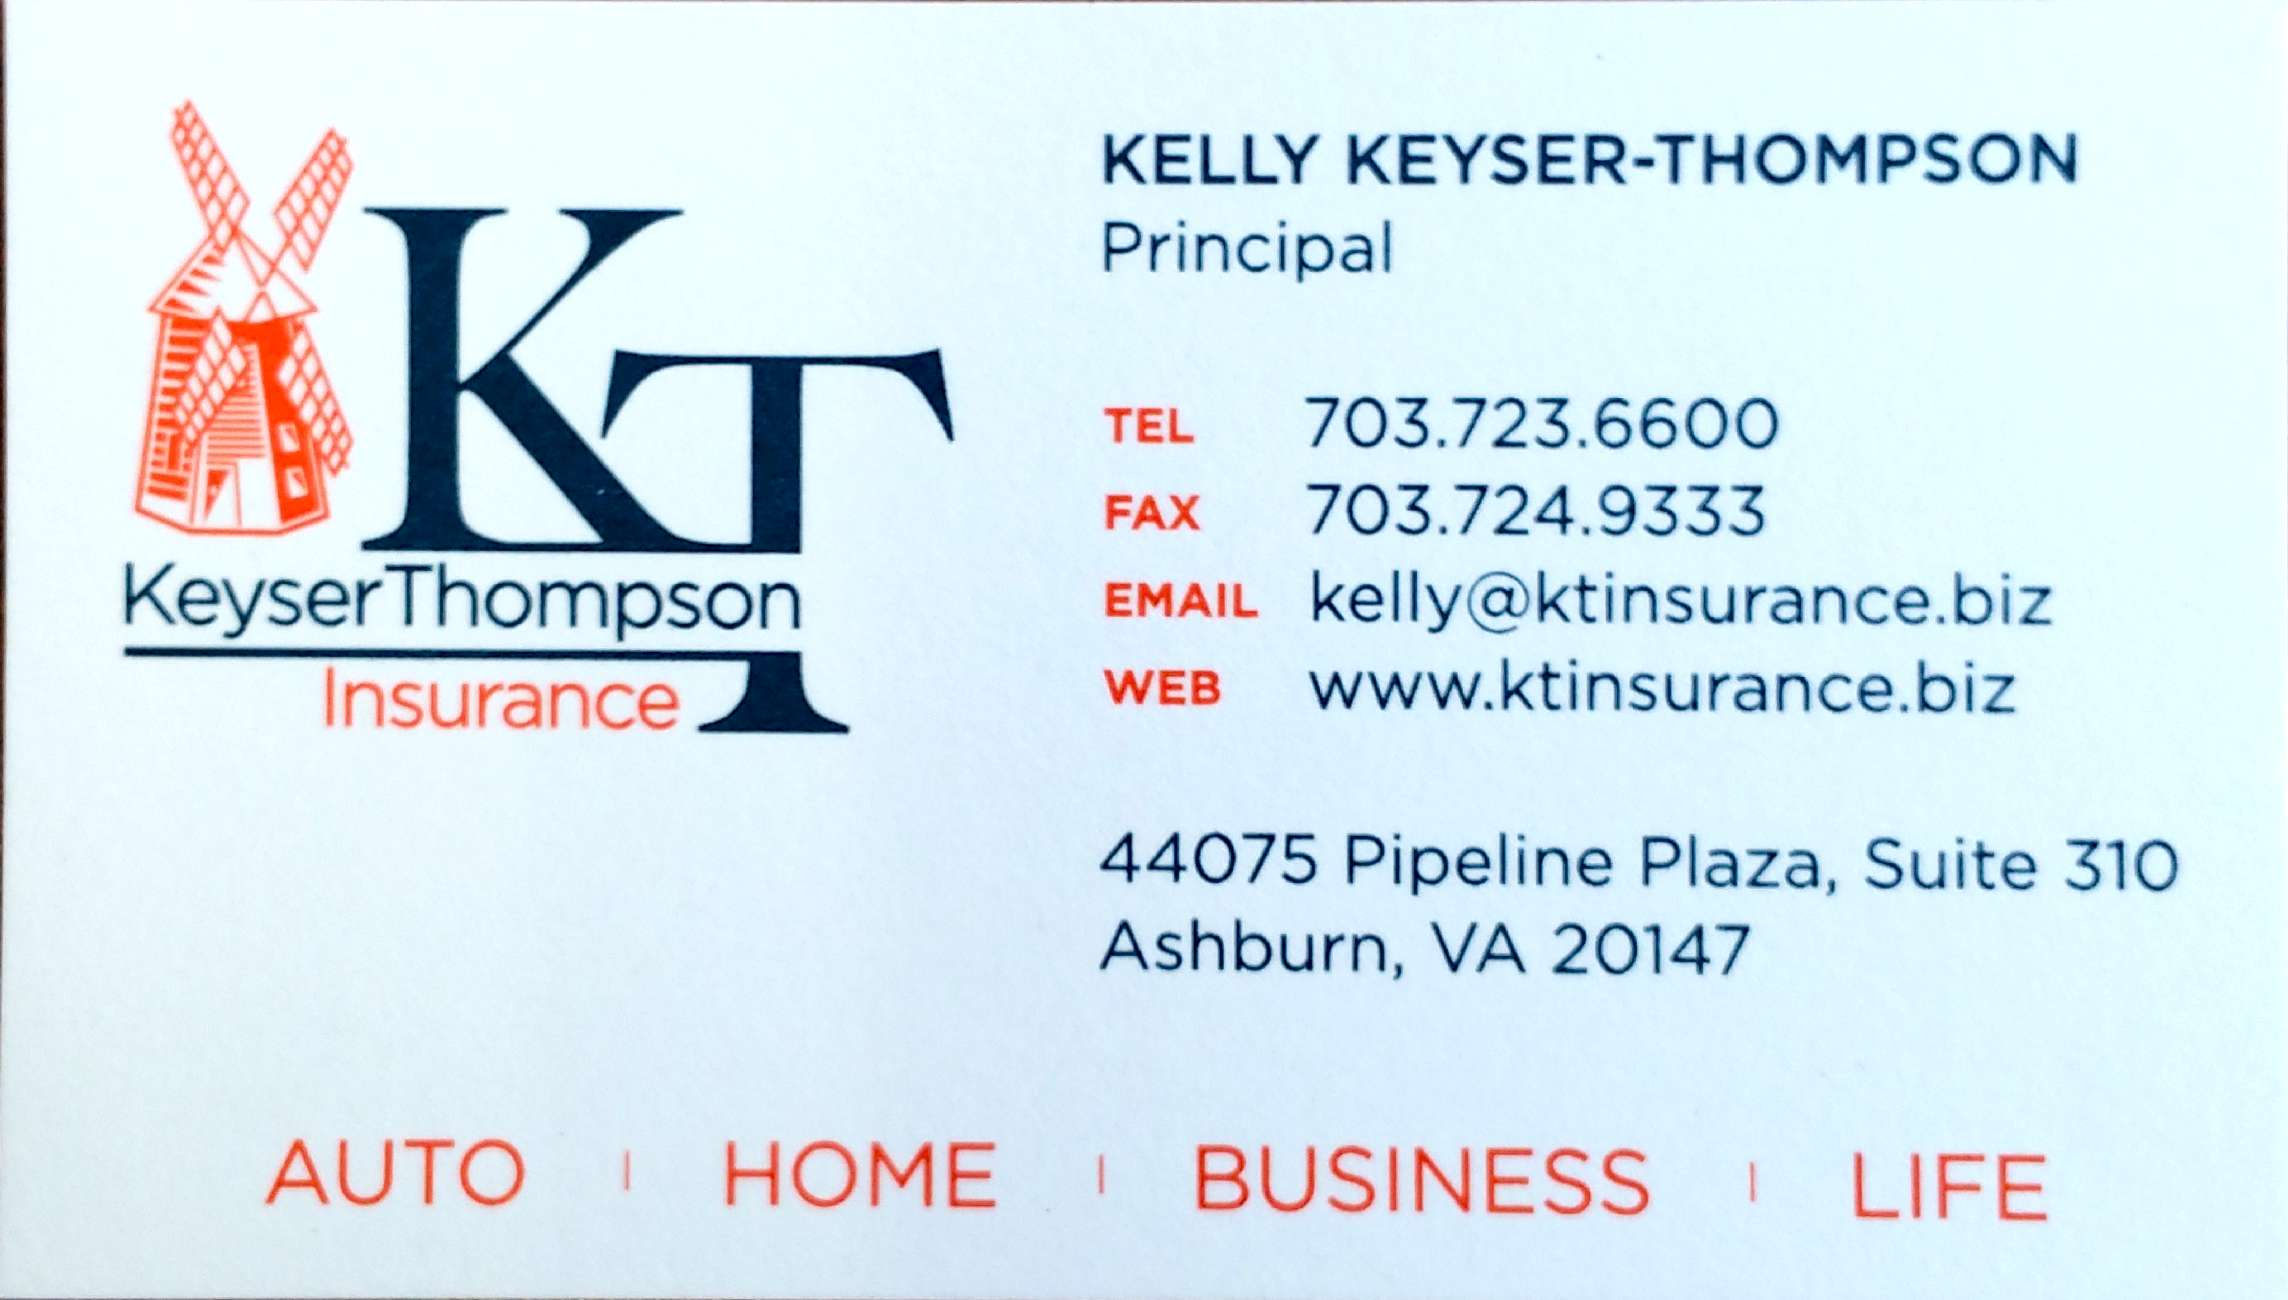 Kelly Keyser-Thompson